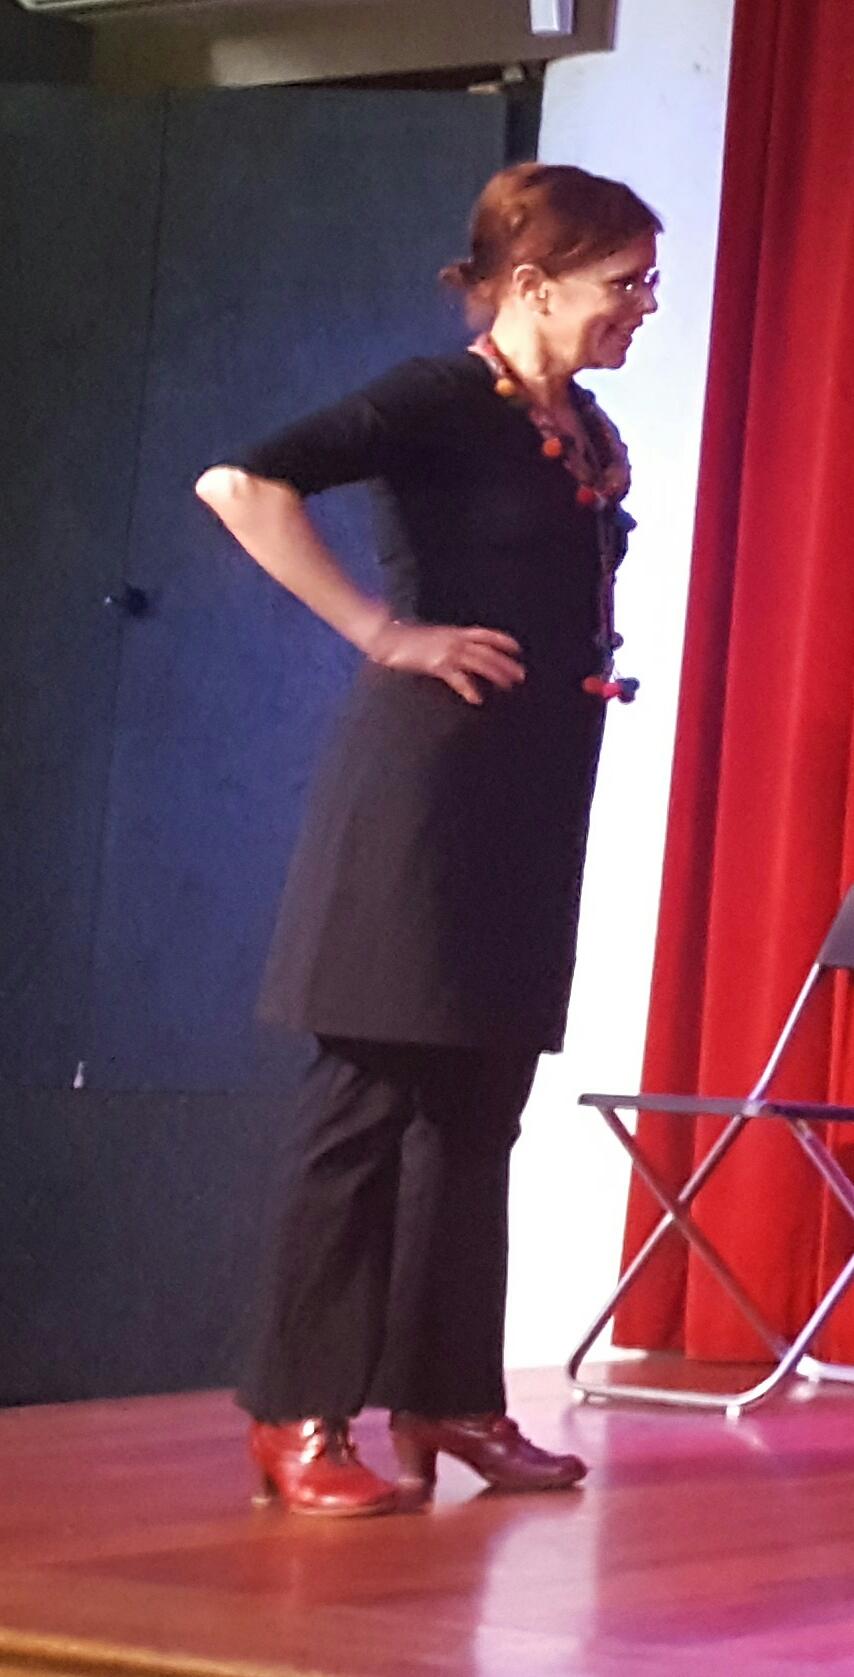 Katherine Kamhi,Shelley Smith (actress) Porn pic Sonia Mishal,Caroline McWilliams